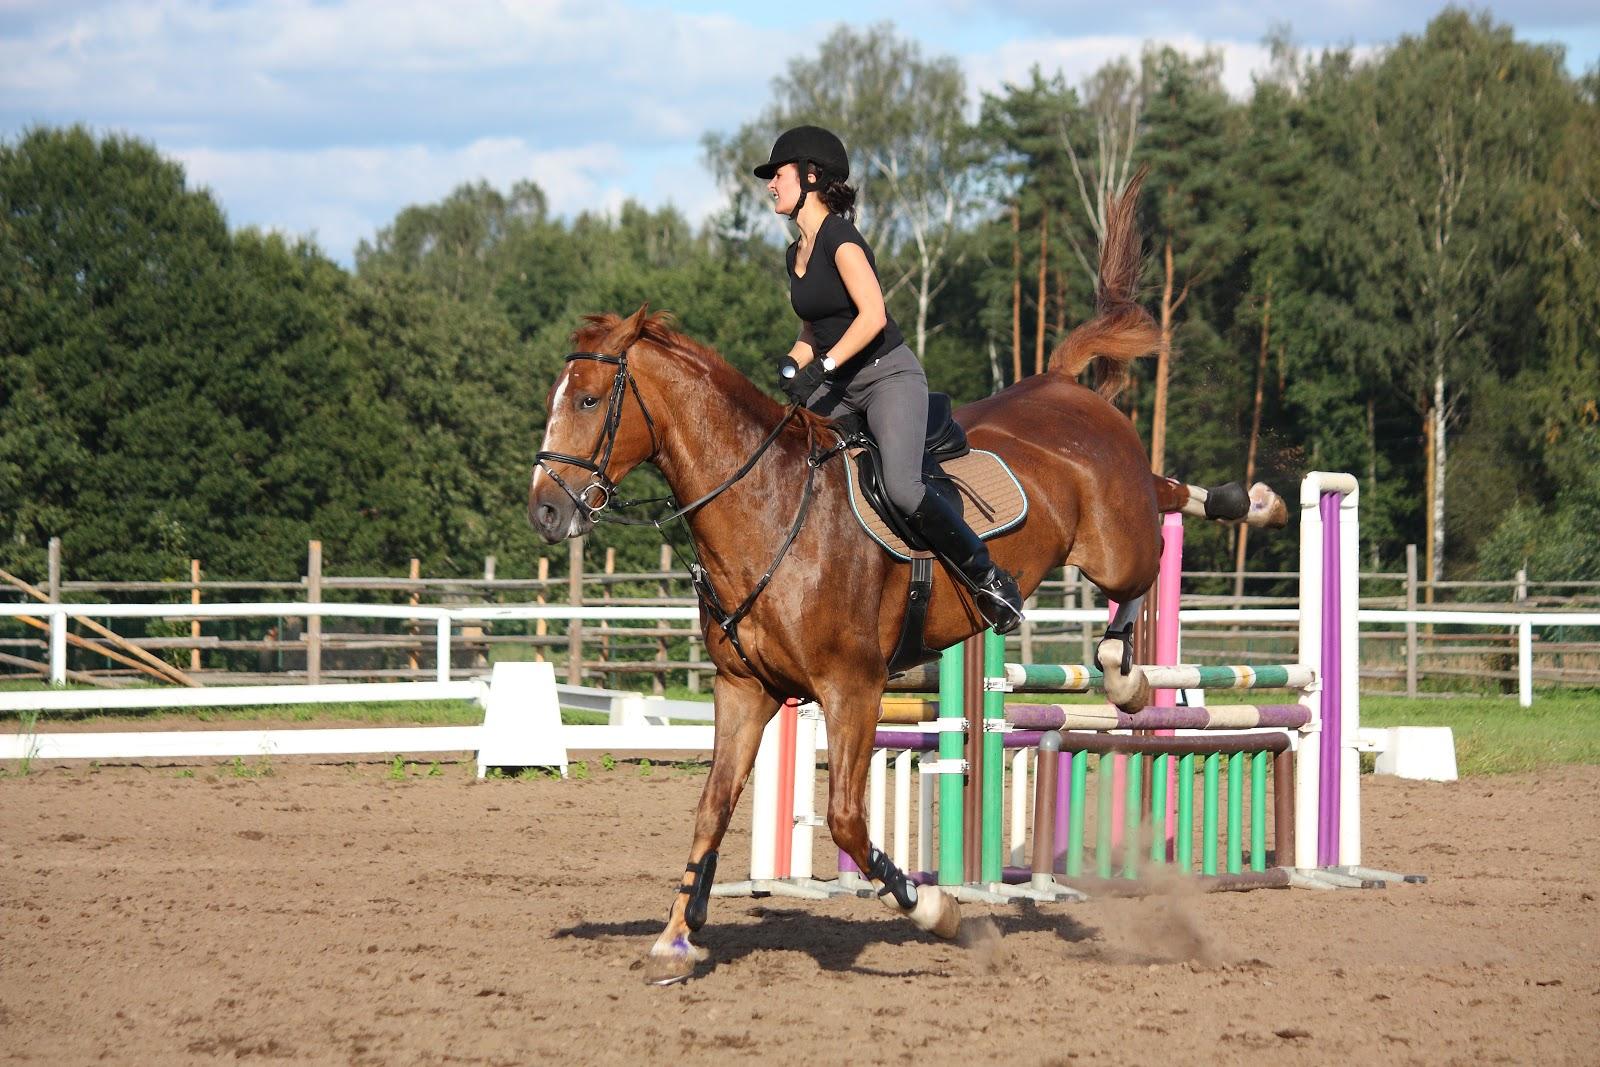 woman riding playful horse